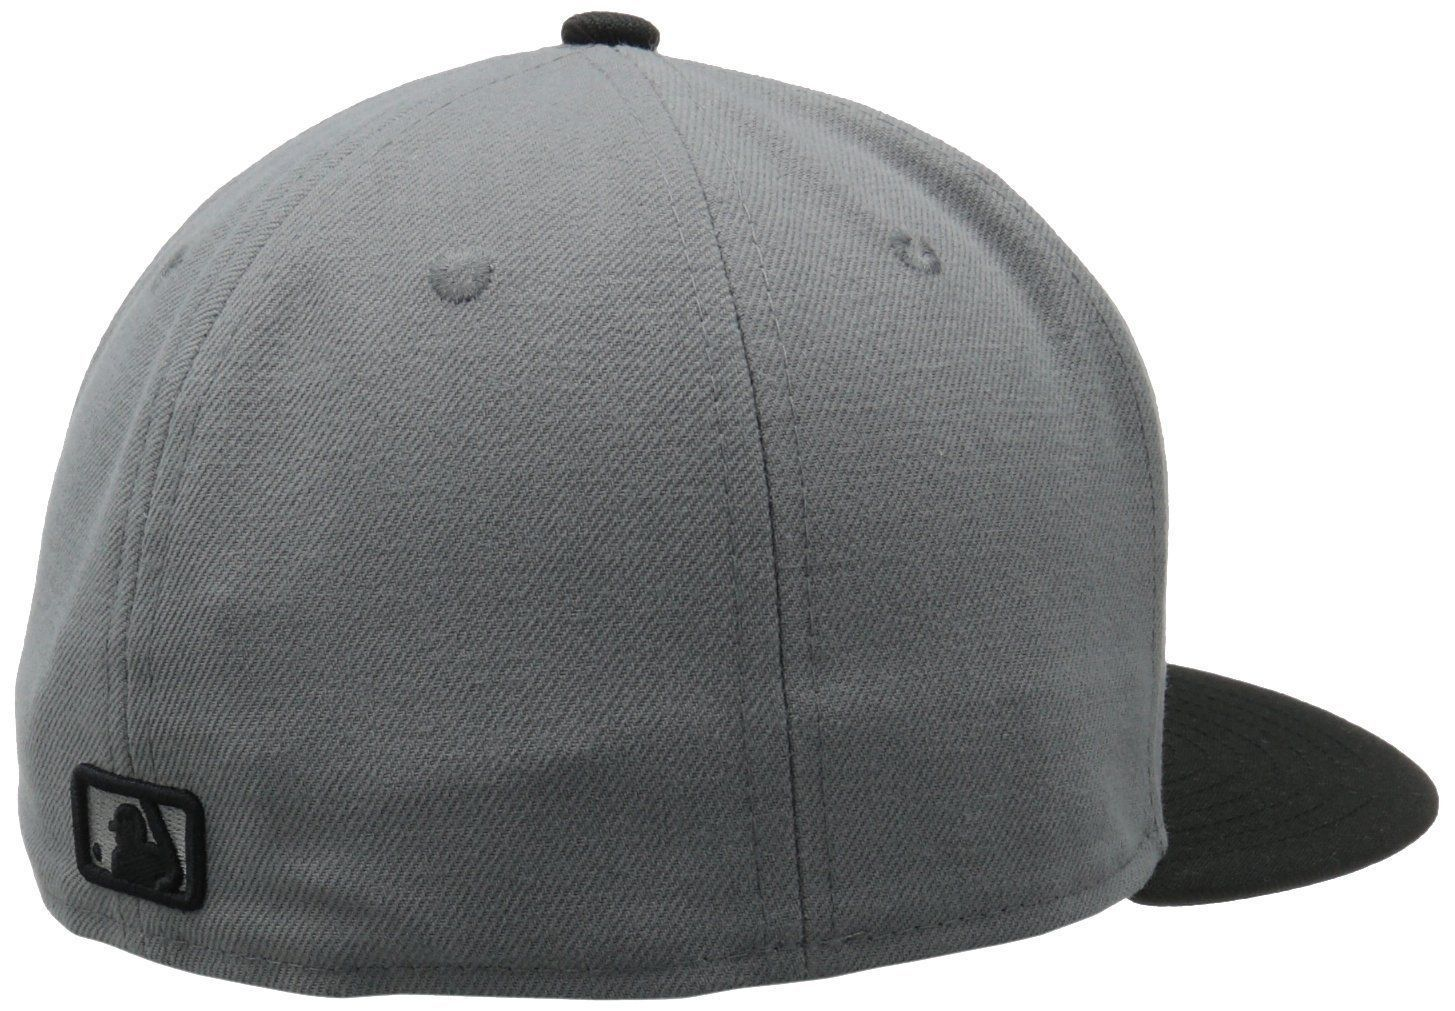 New Era 59Fifty MLB Philadelphia Philles Storm Gray/Black  Baseball Fitted Cap